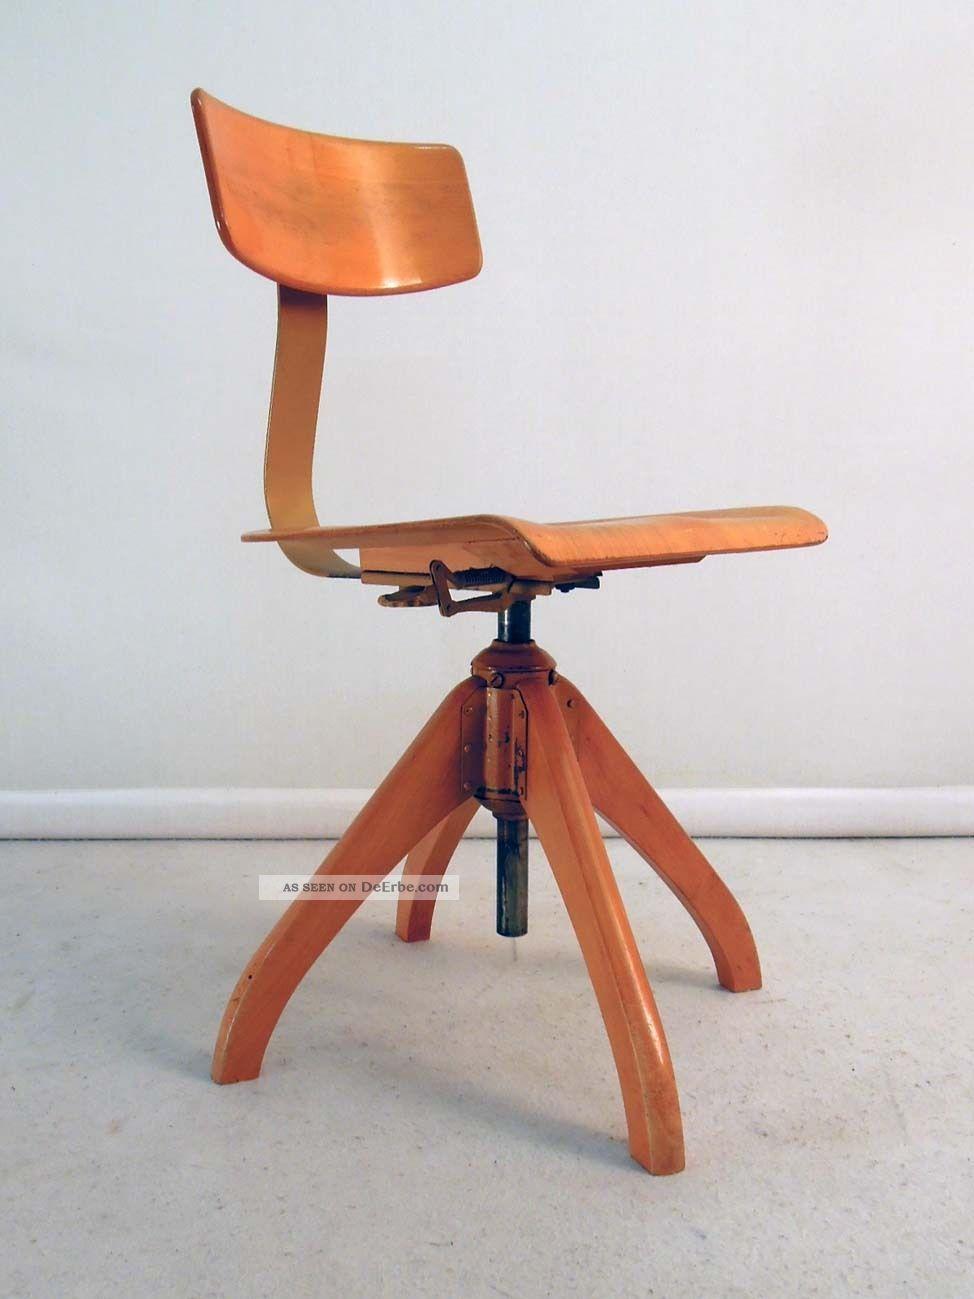 50er Jahre Ama Elastik Bürostuhl Stuhl Chair - Eiermann Jacobsen Eames Ers 1950-1959 Bild